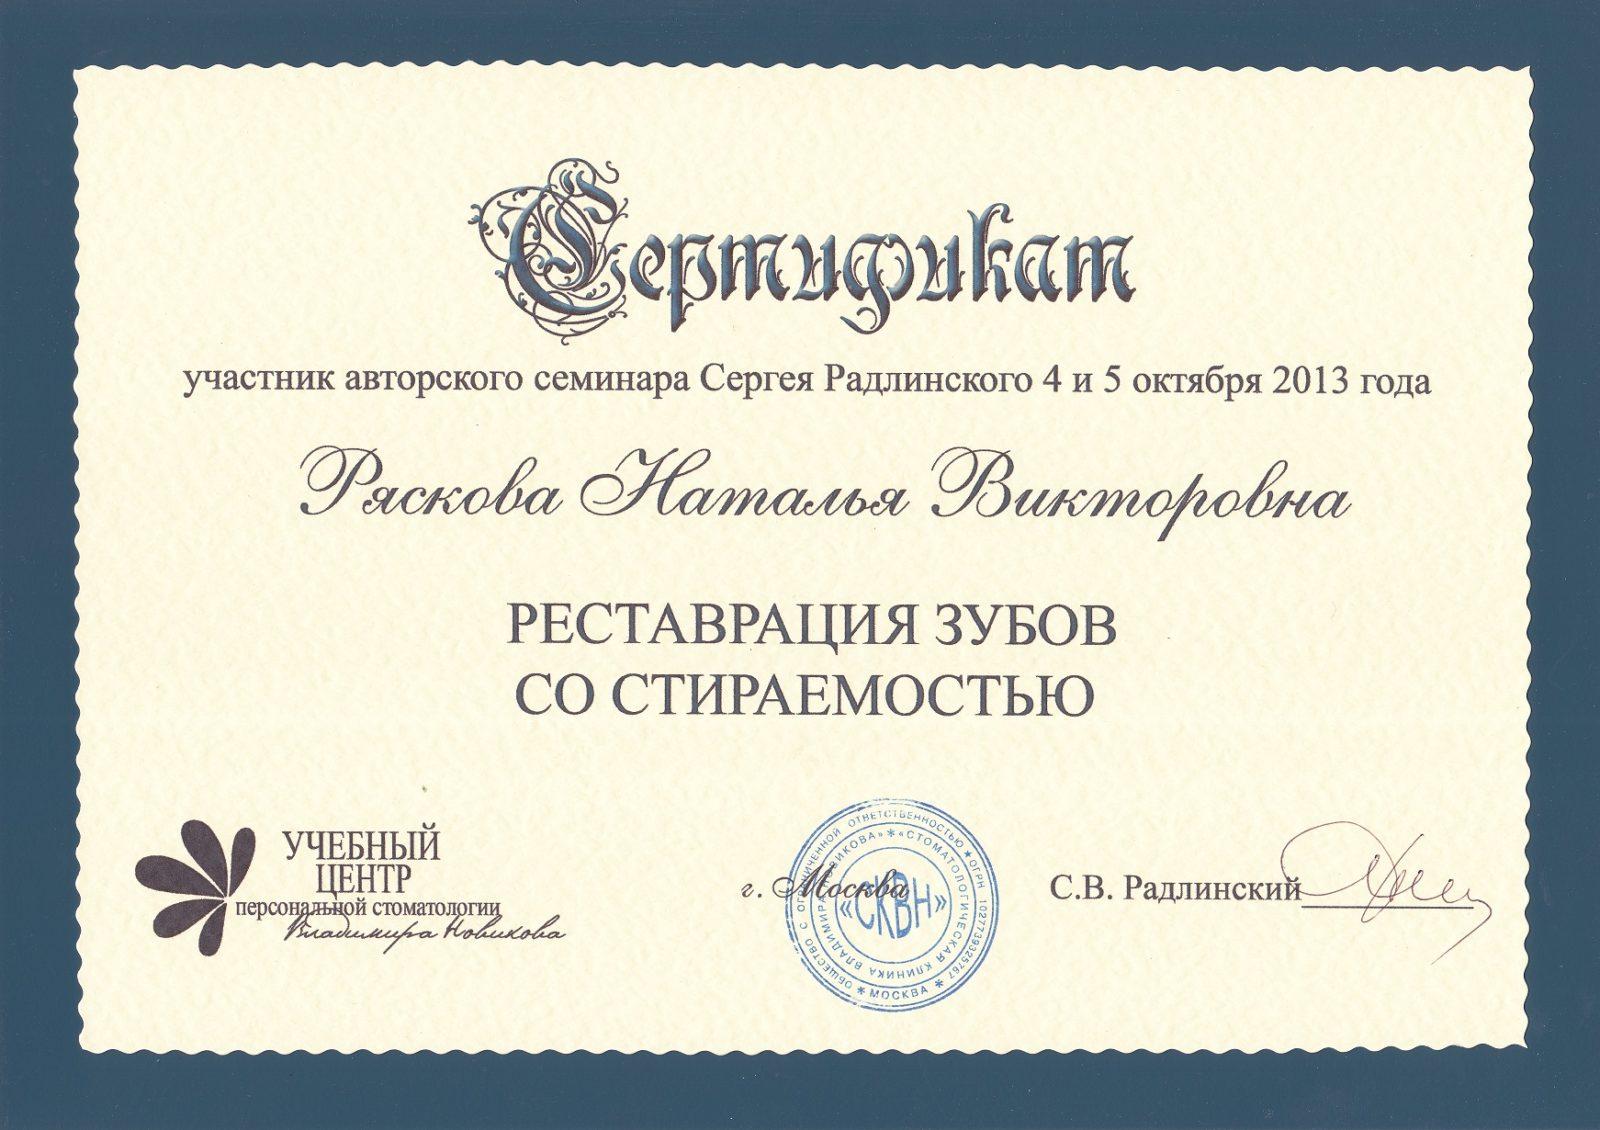 http://oris-vidnoe.ru/wp-content/uploads/2021/05/ryaskova2.jpg